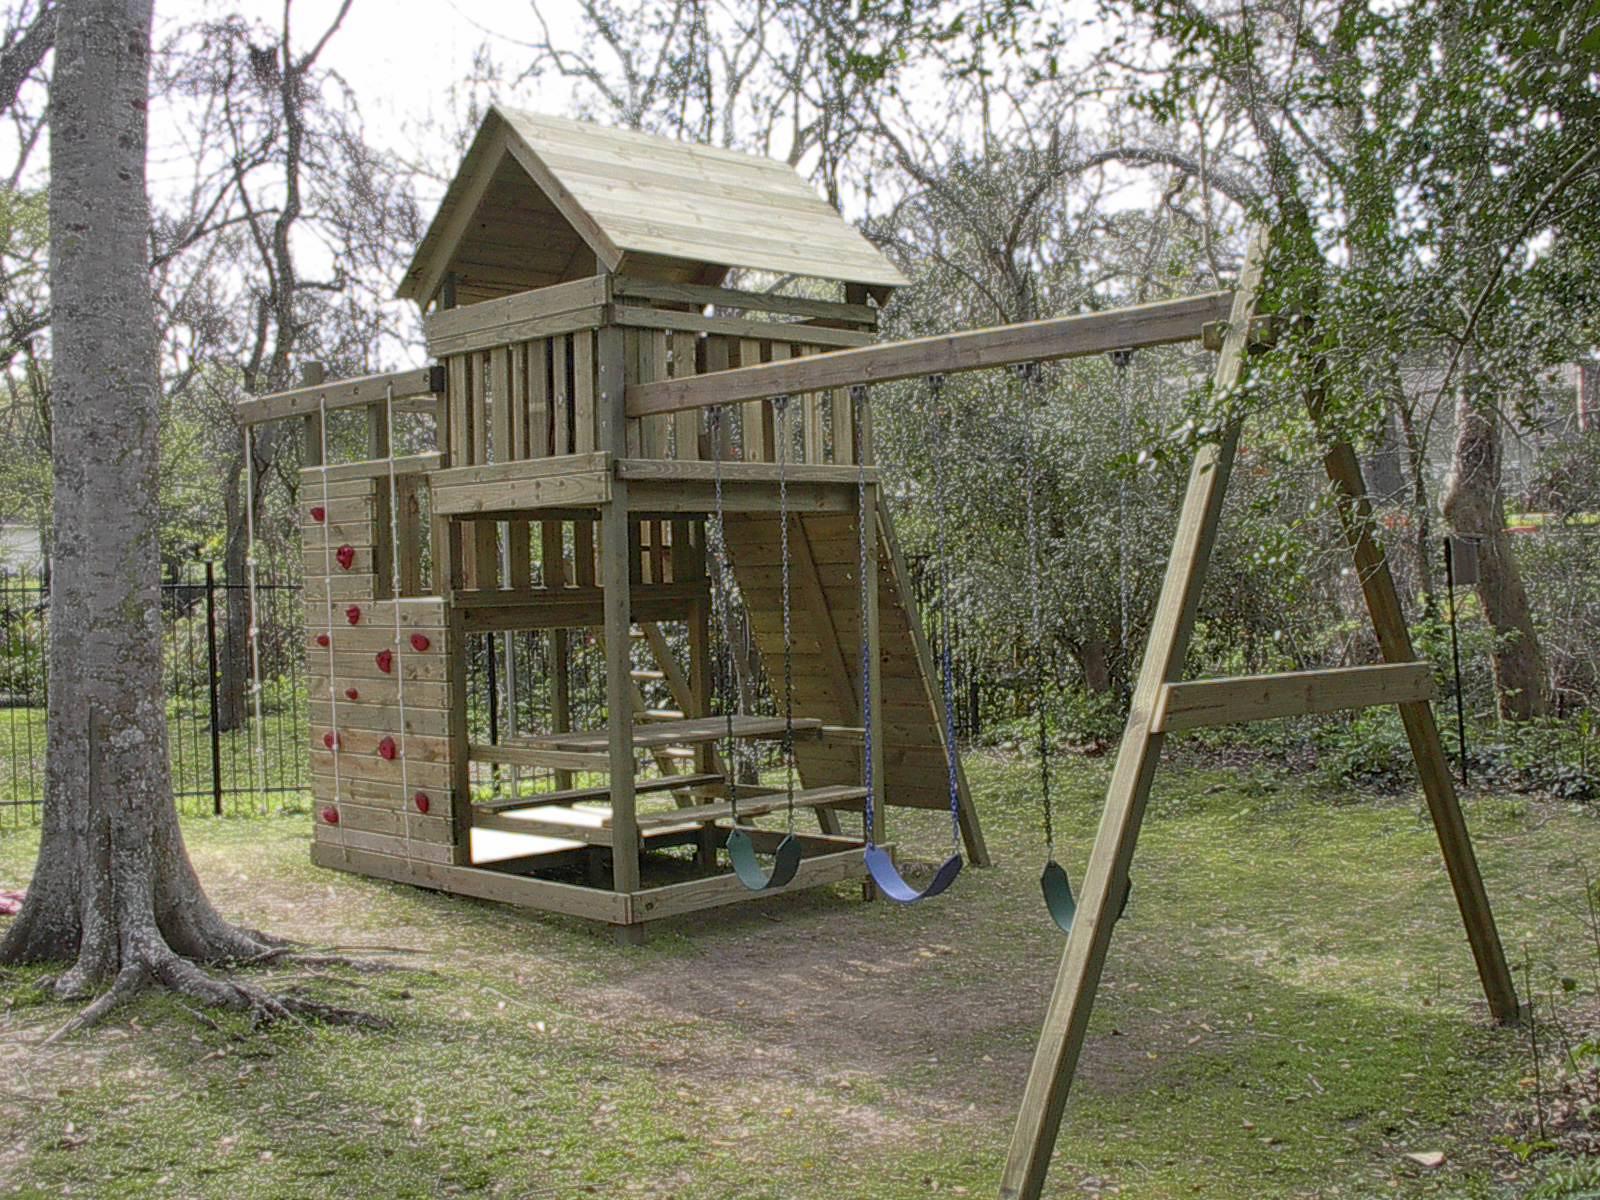 DIY Swing Set Plans  Gemini Playset DIY Wood Fort and Swingset Plans